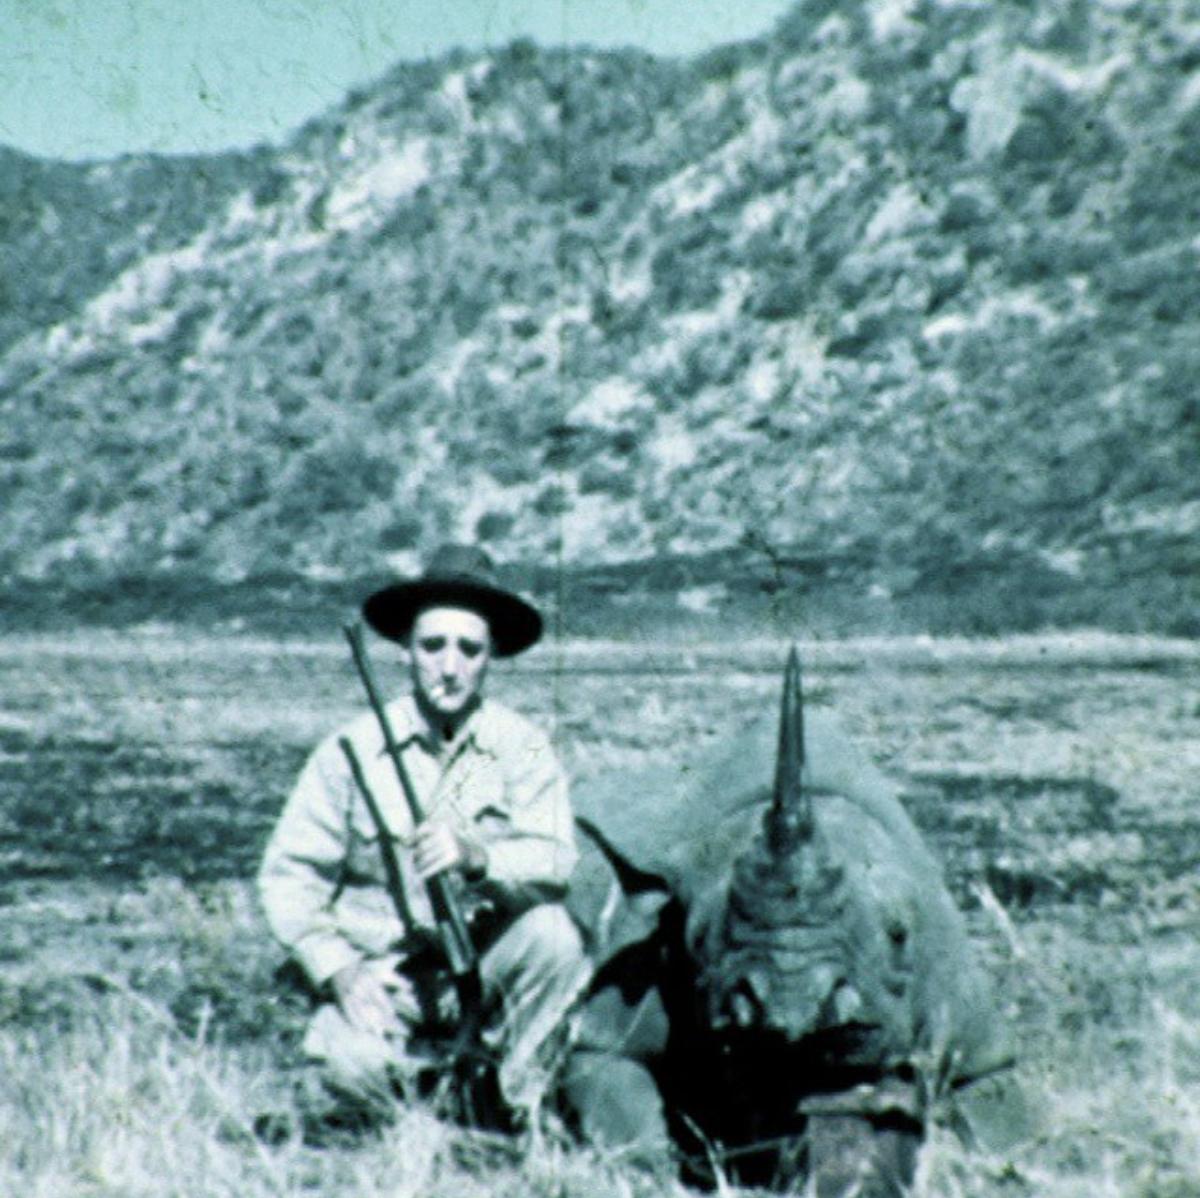 Sykes family patriarch Howard poses with his first rhino kill of the safari, 1937